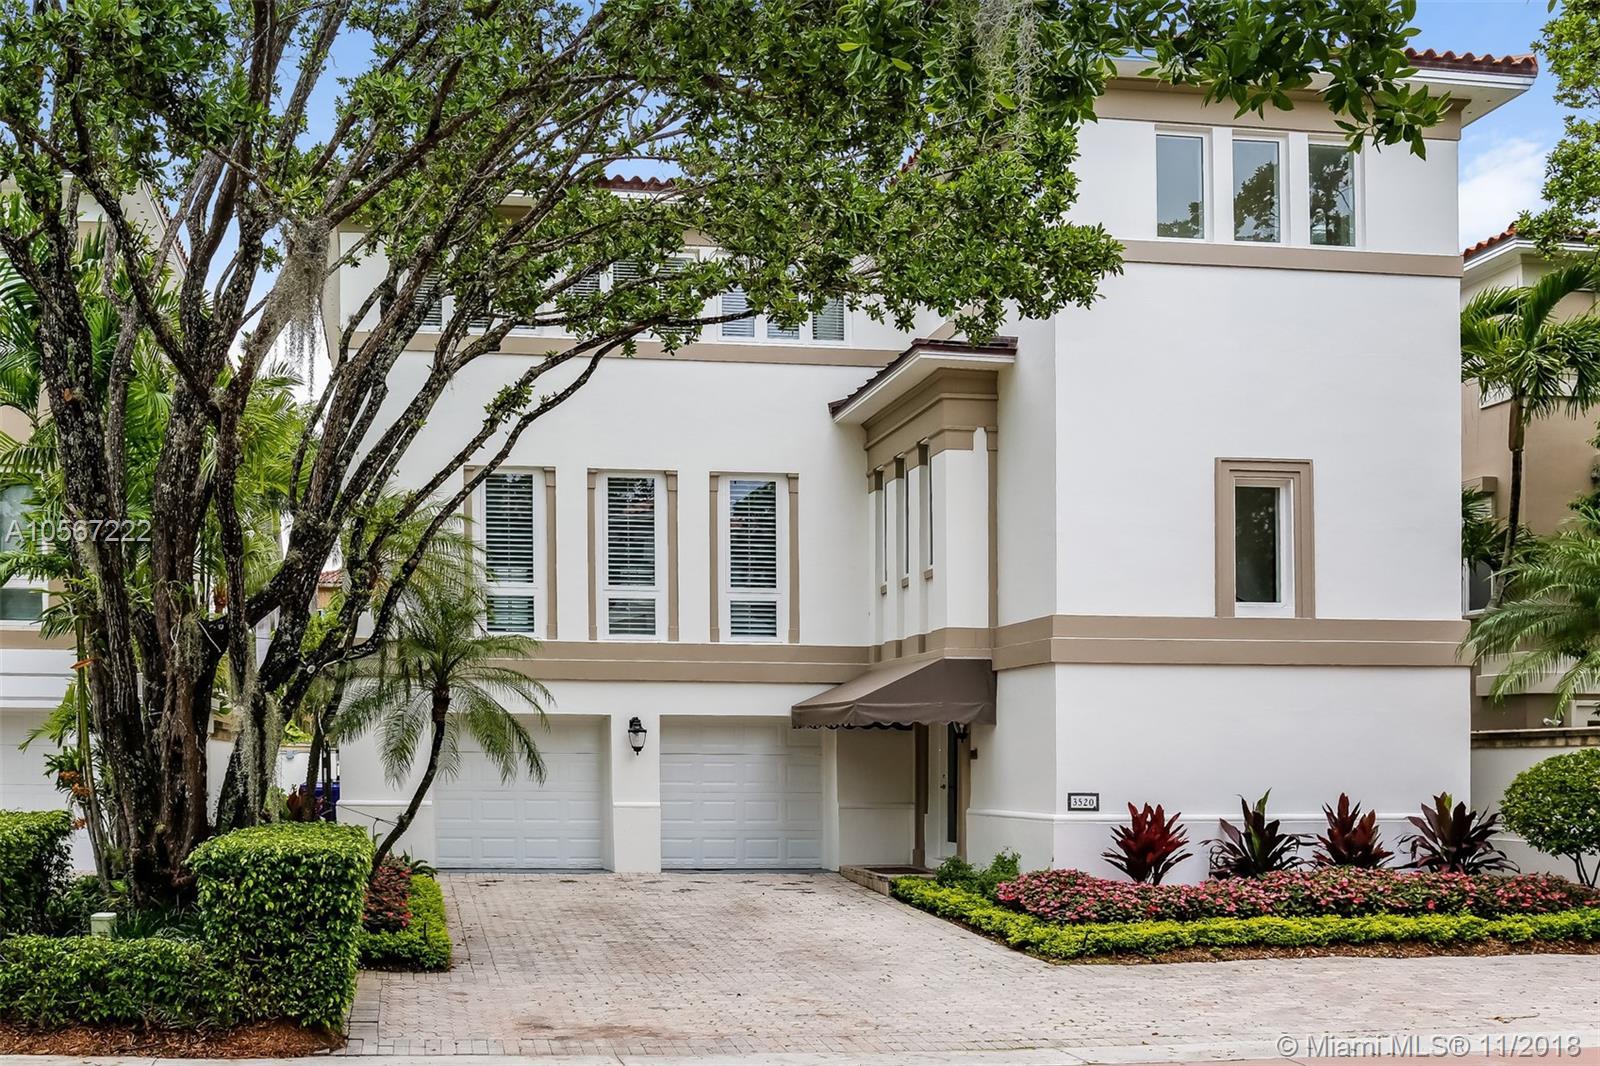 3520 Bayshore Villas Dr, Miami, FL 33133